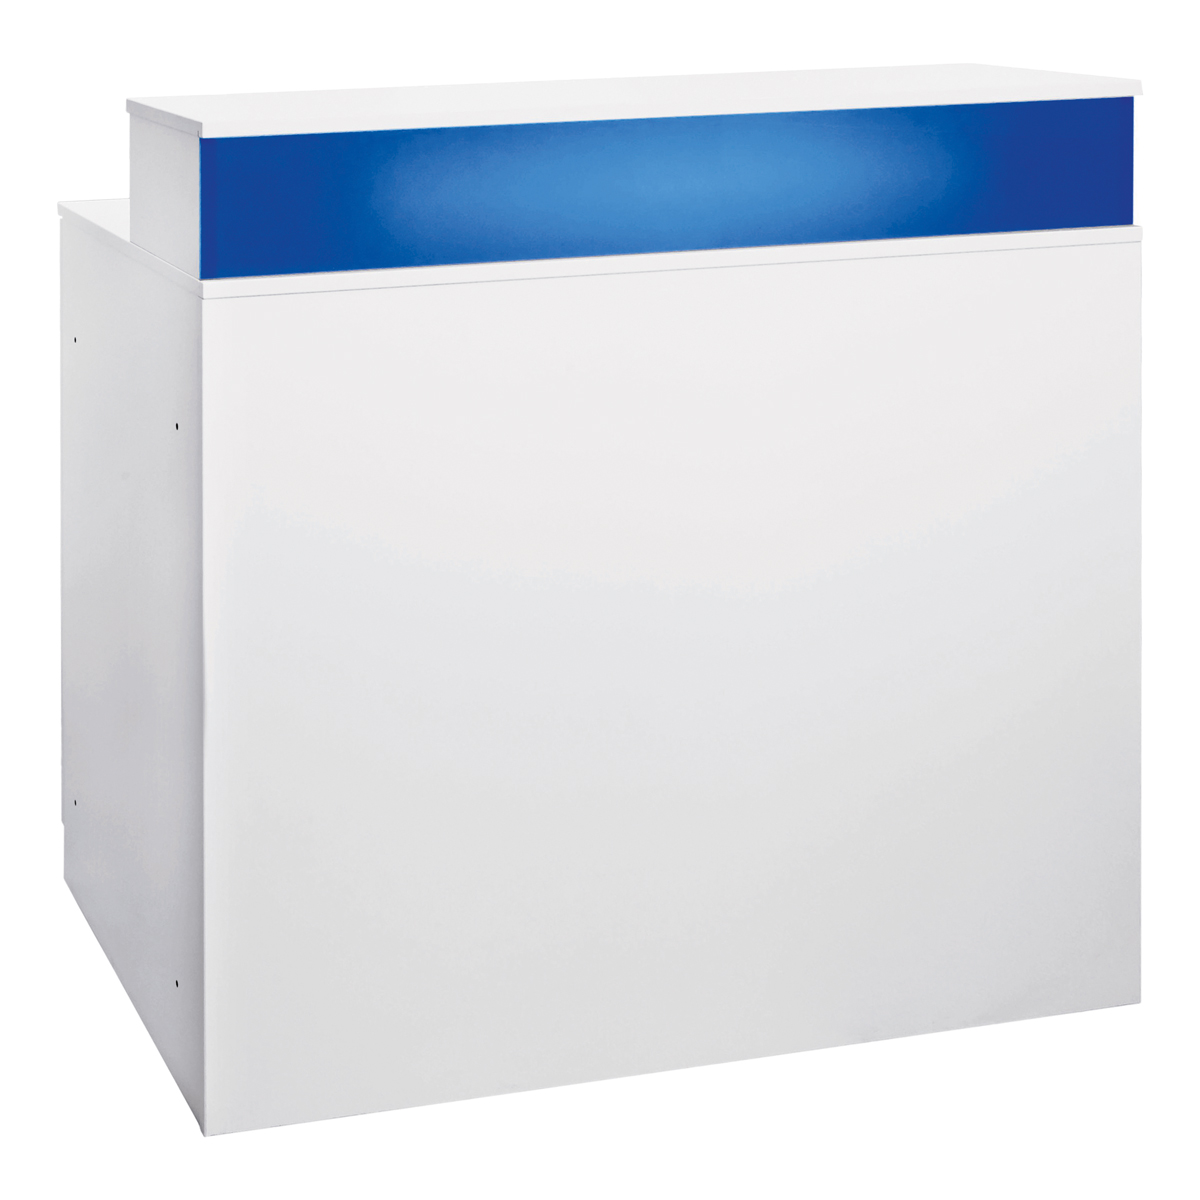 Theke Bianco, blau